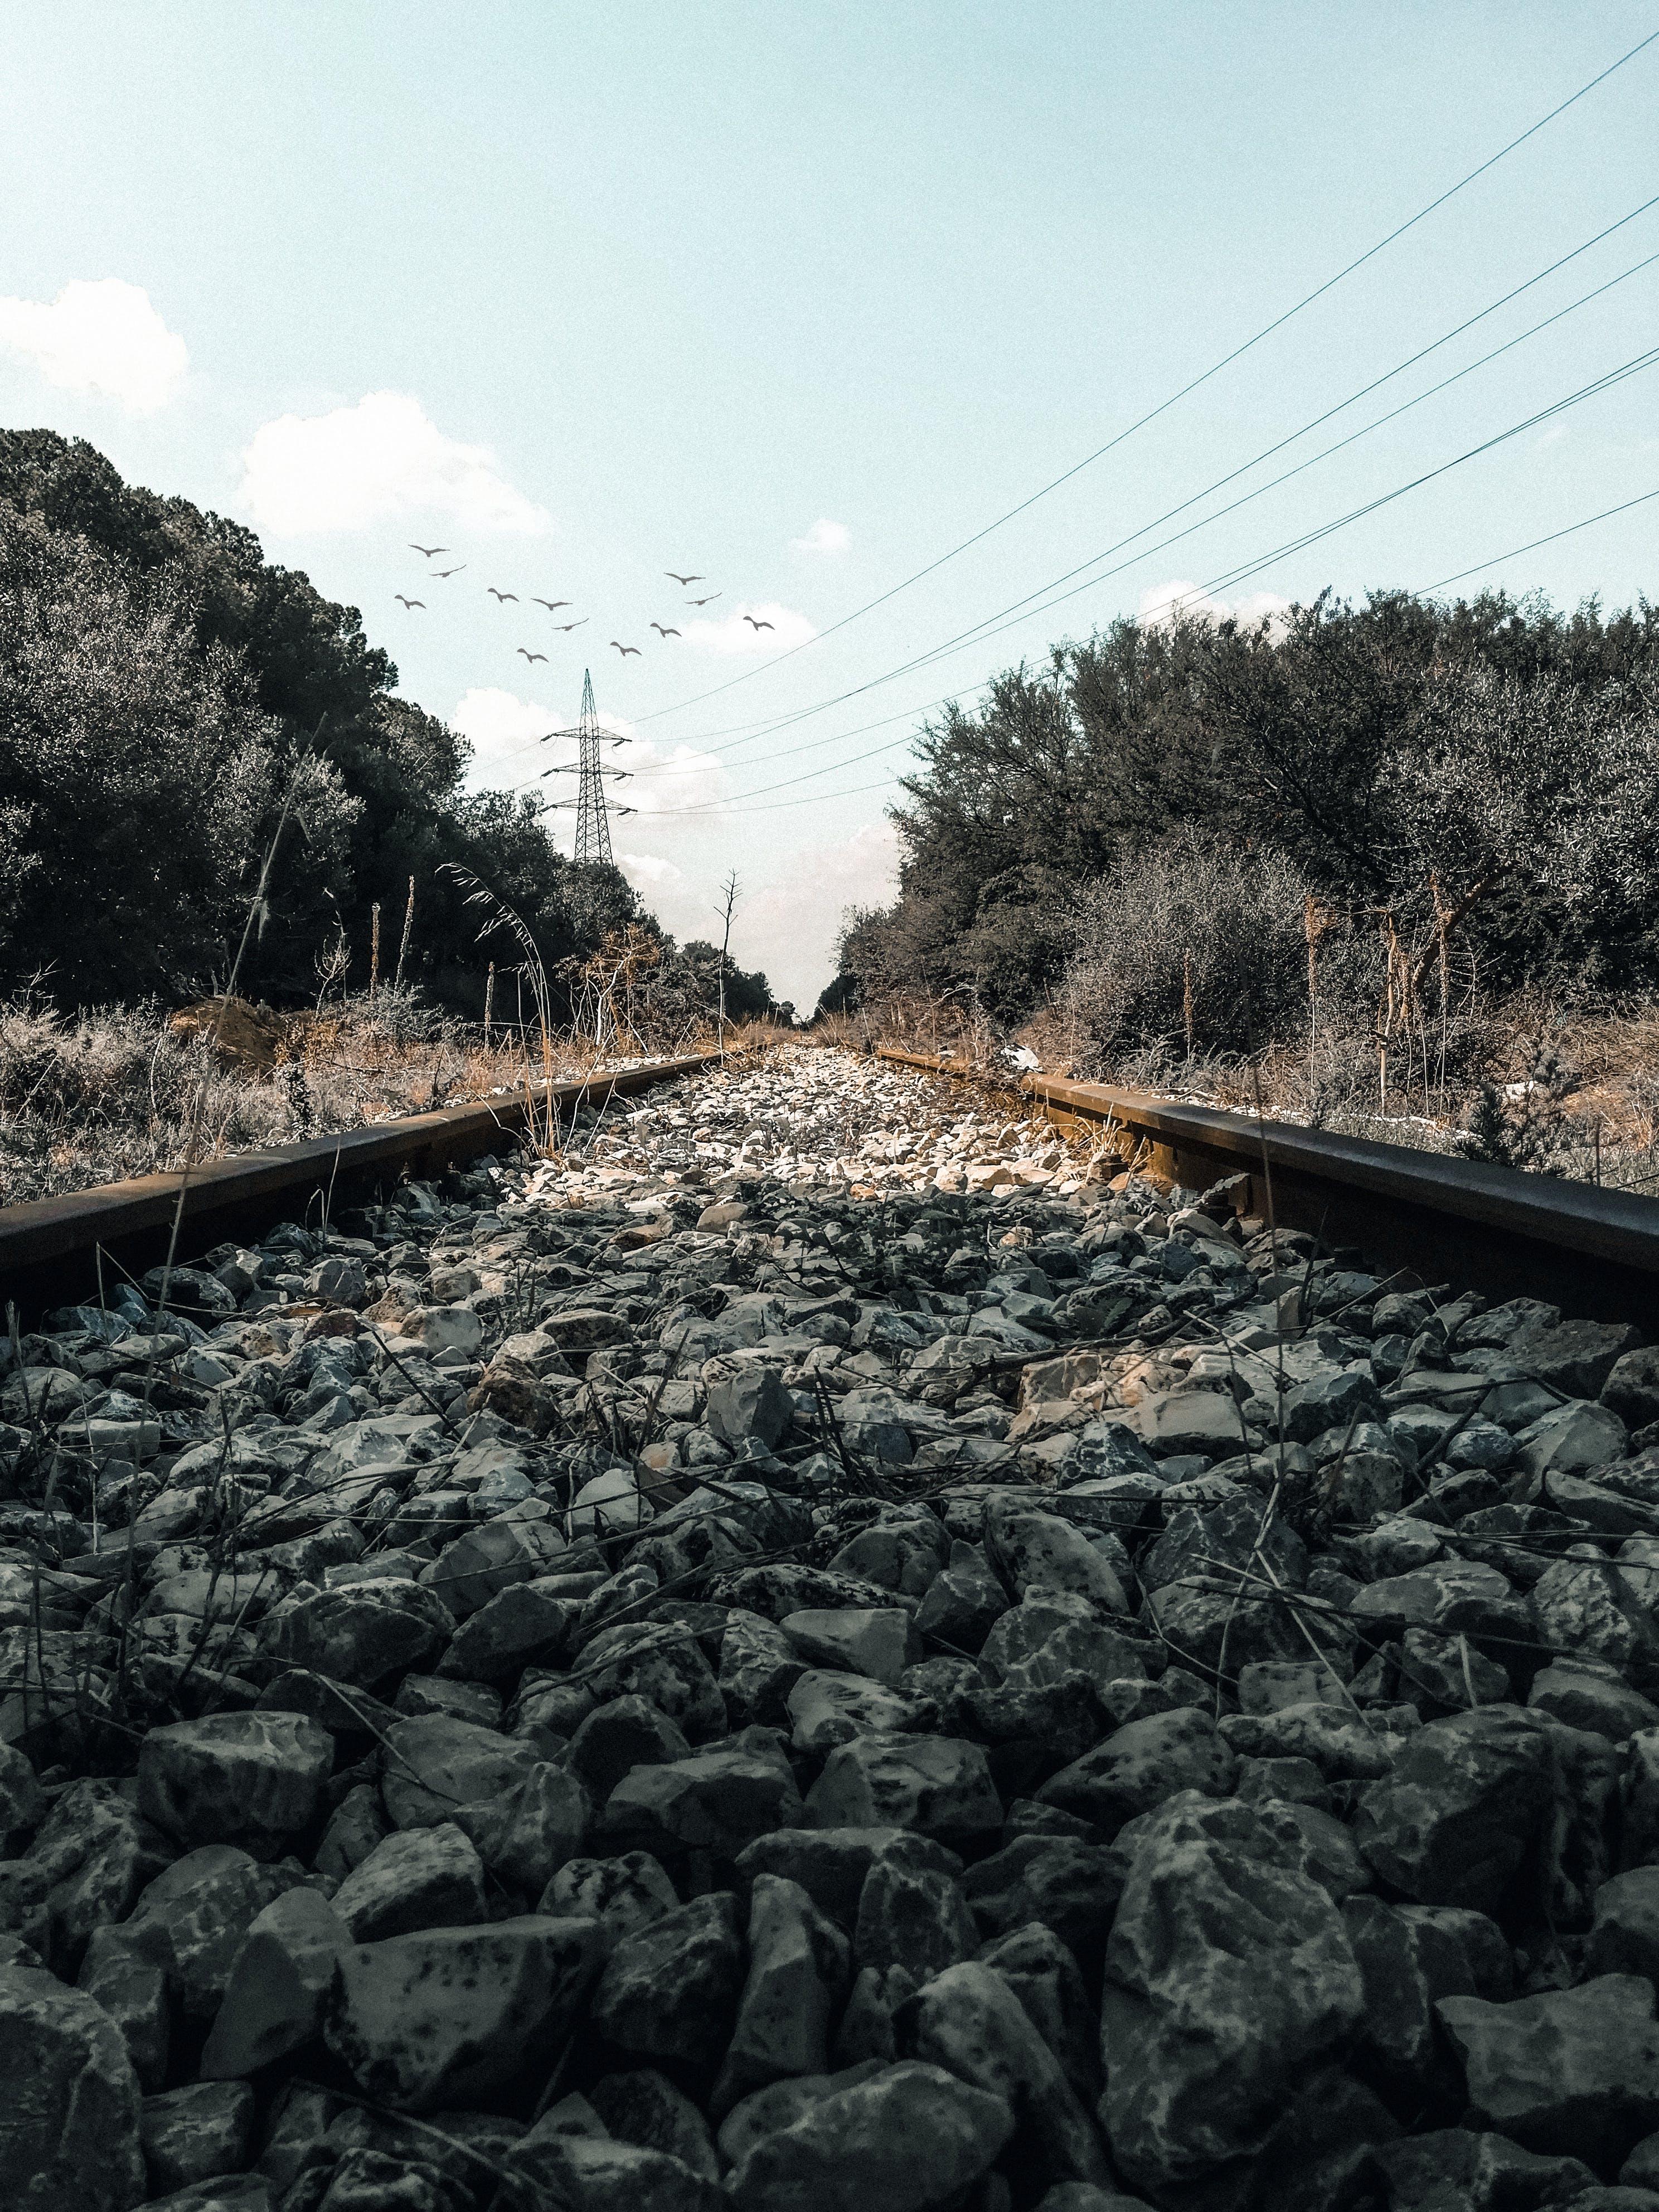 Free stock photo of forest, railway, railway line, train